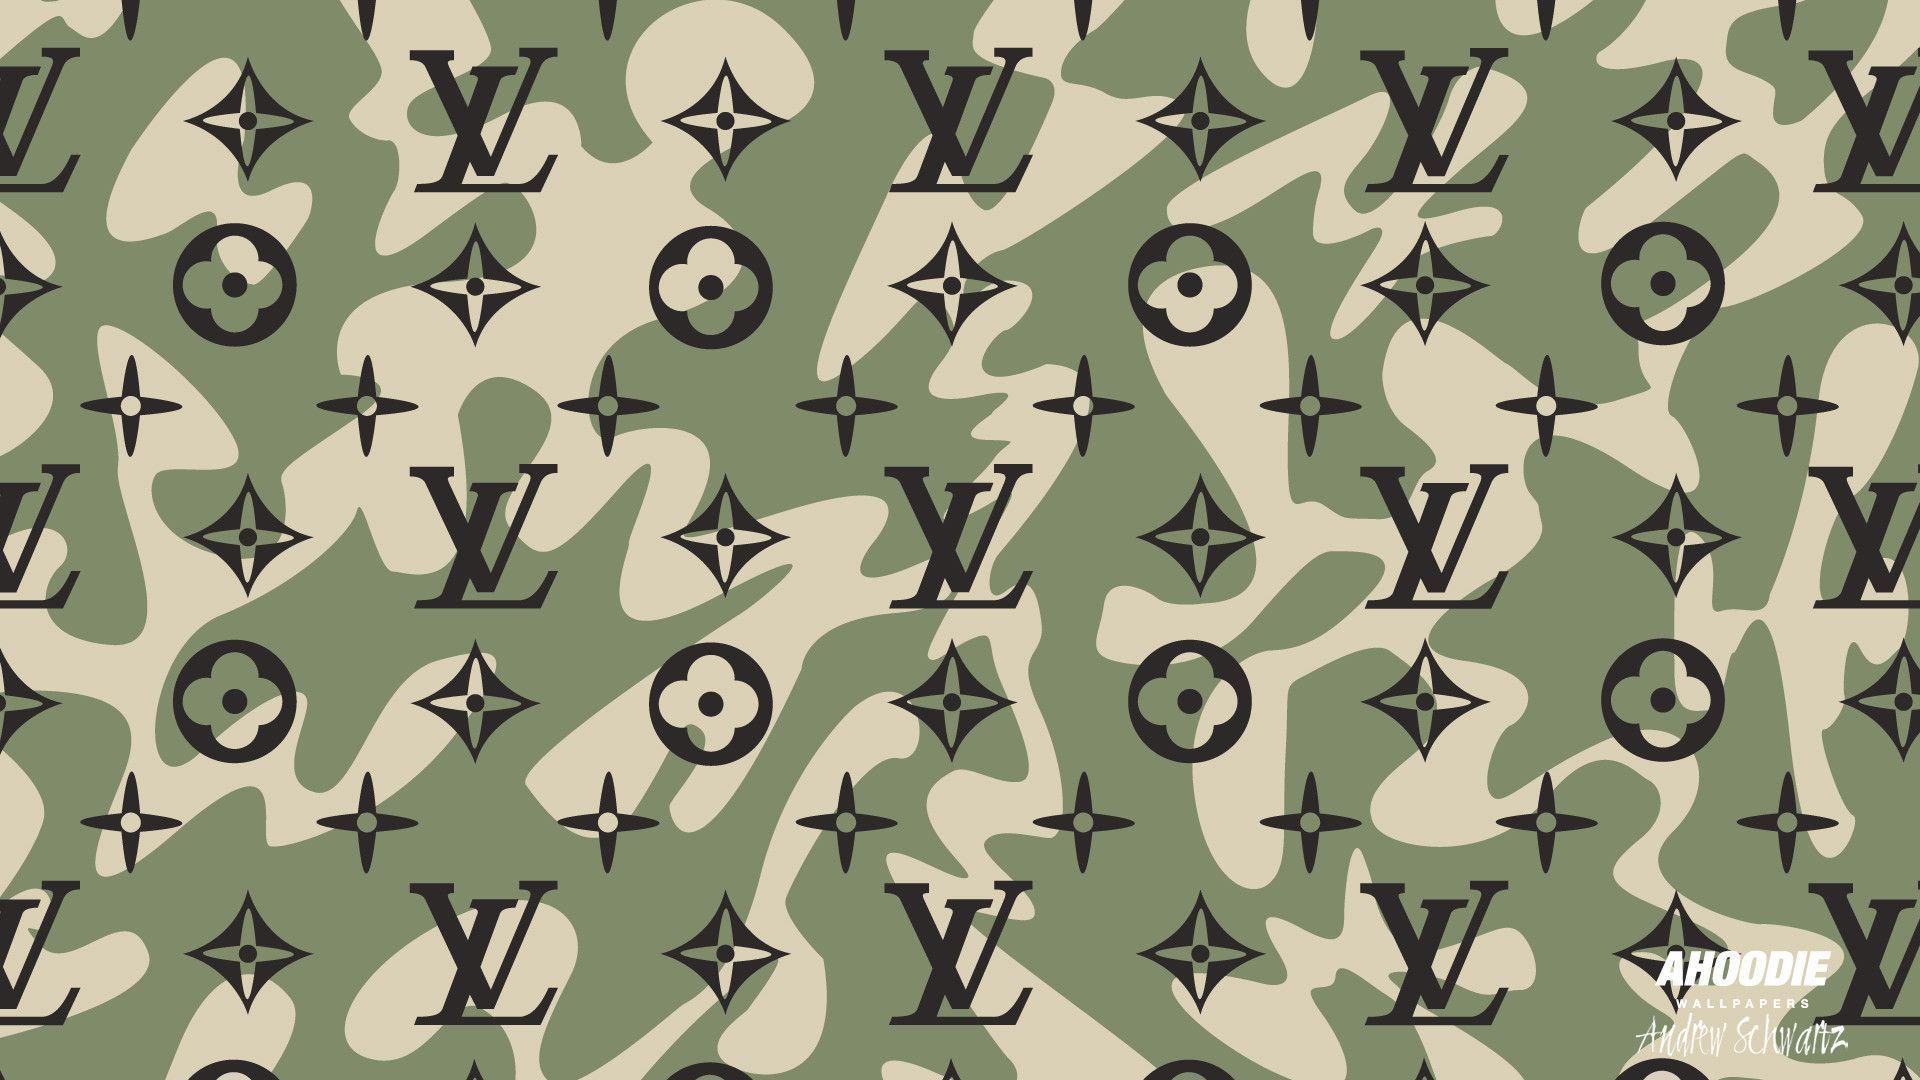 Wallpapers For > Louis Vuitton Wallpaper Hd